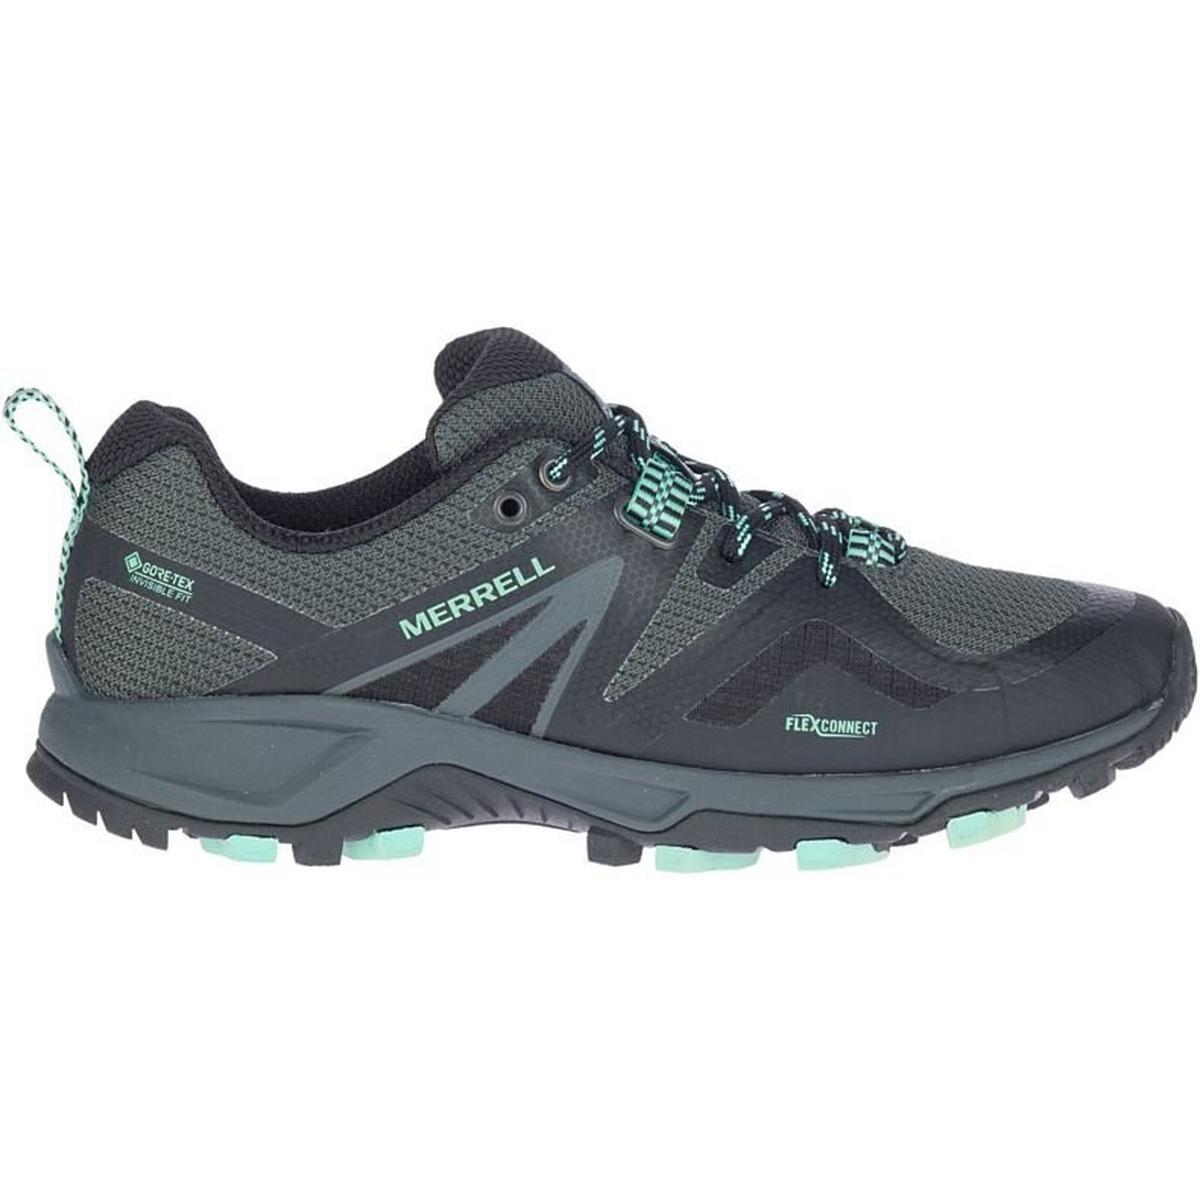 Merrell Women's Merrell MQM Flex 2 GORE-TEX Walking Shoe - Black